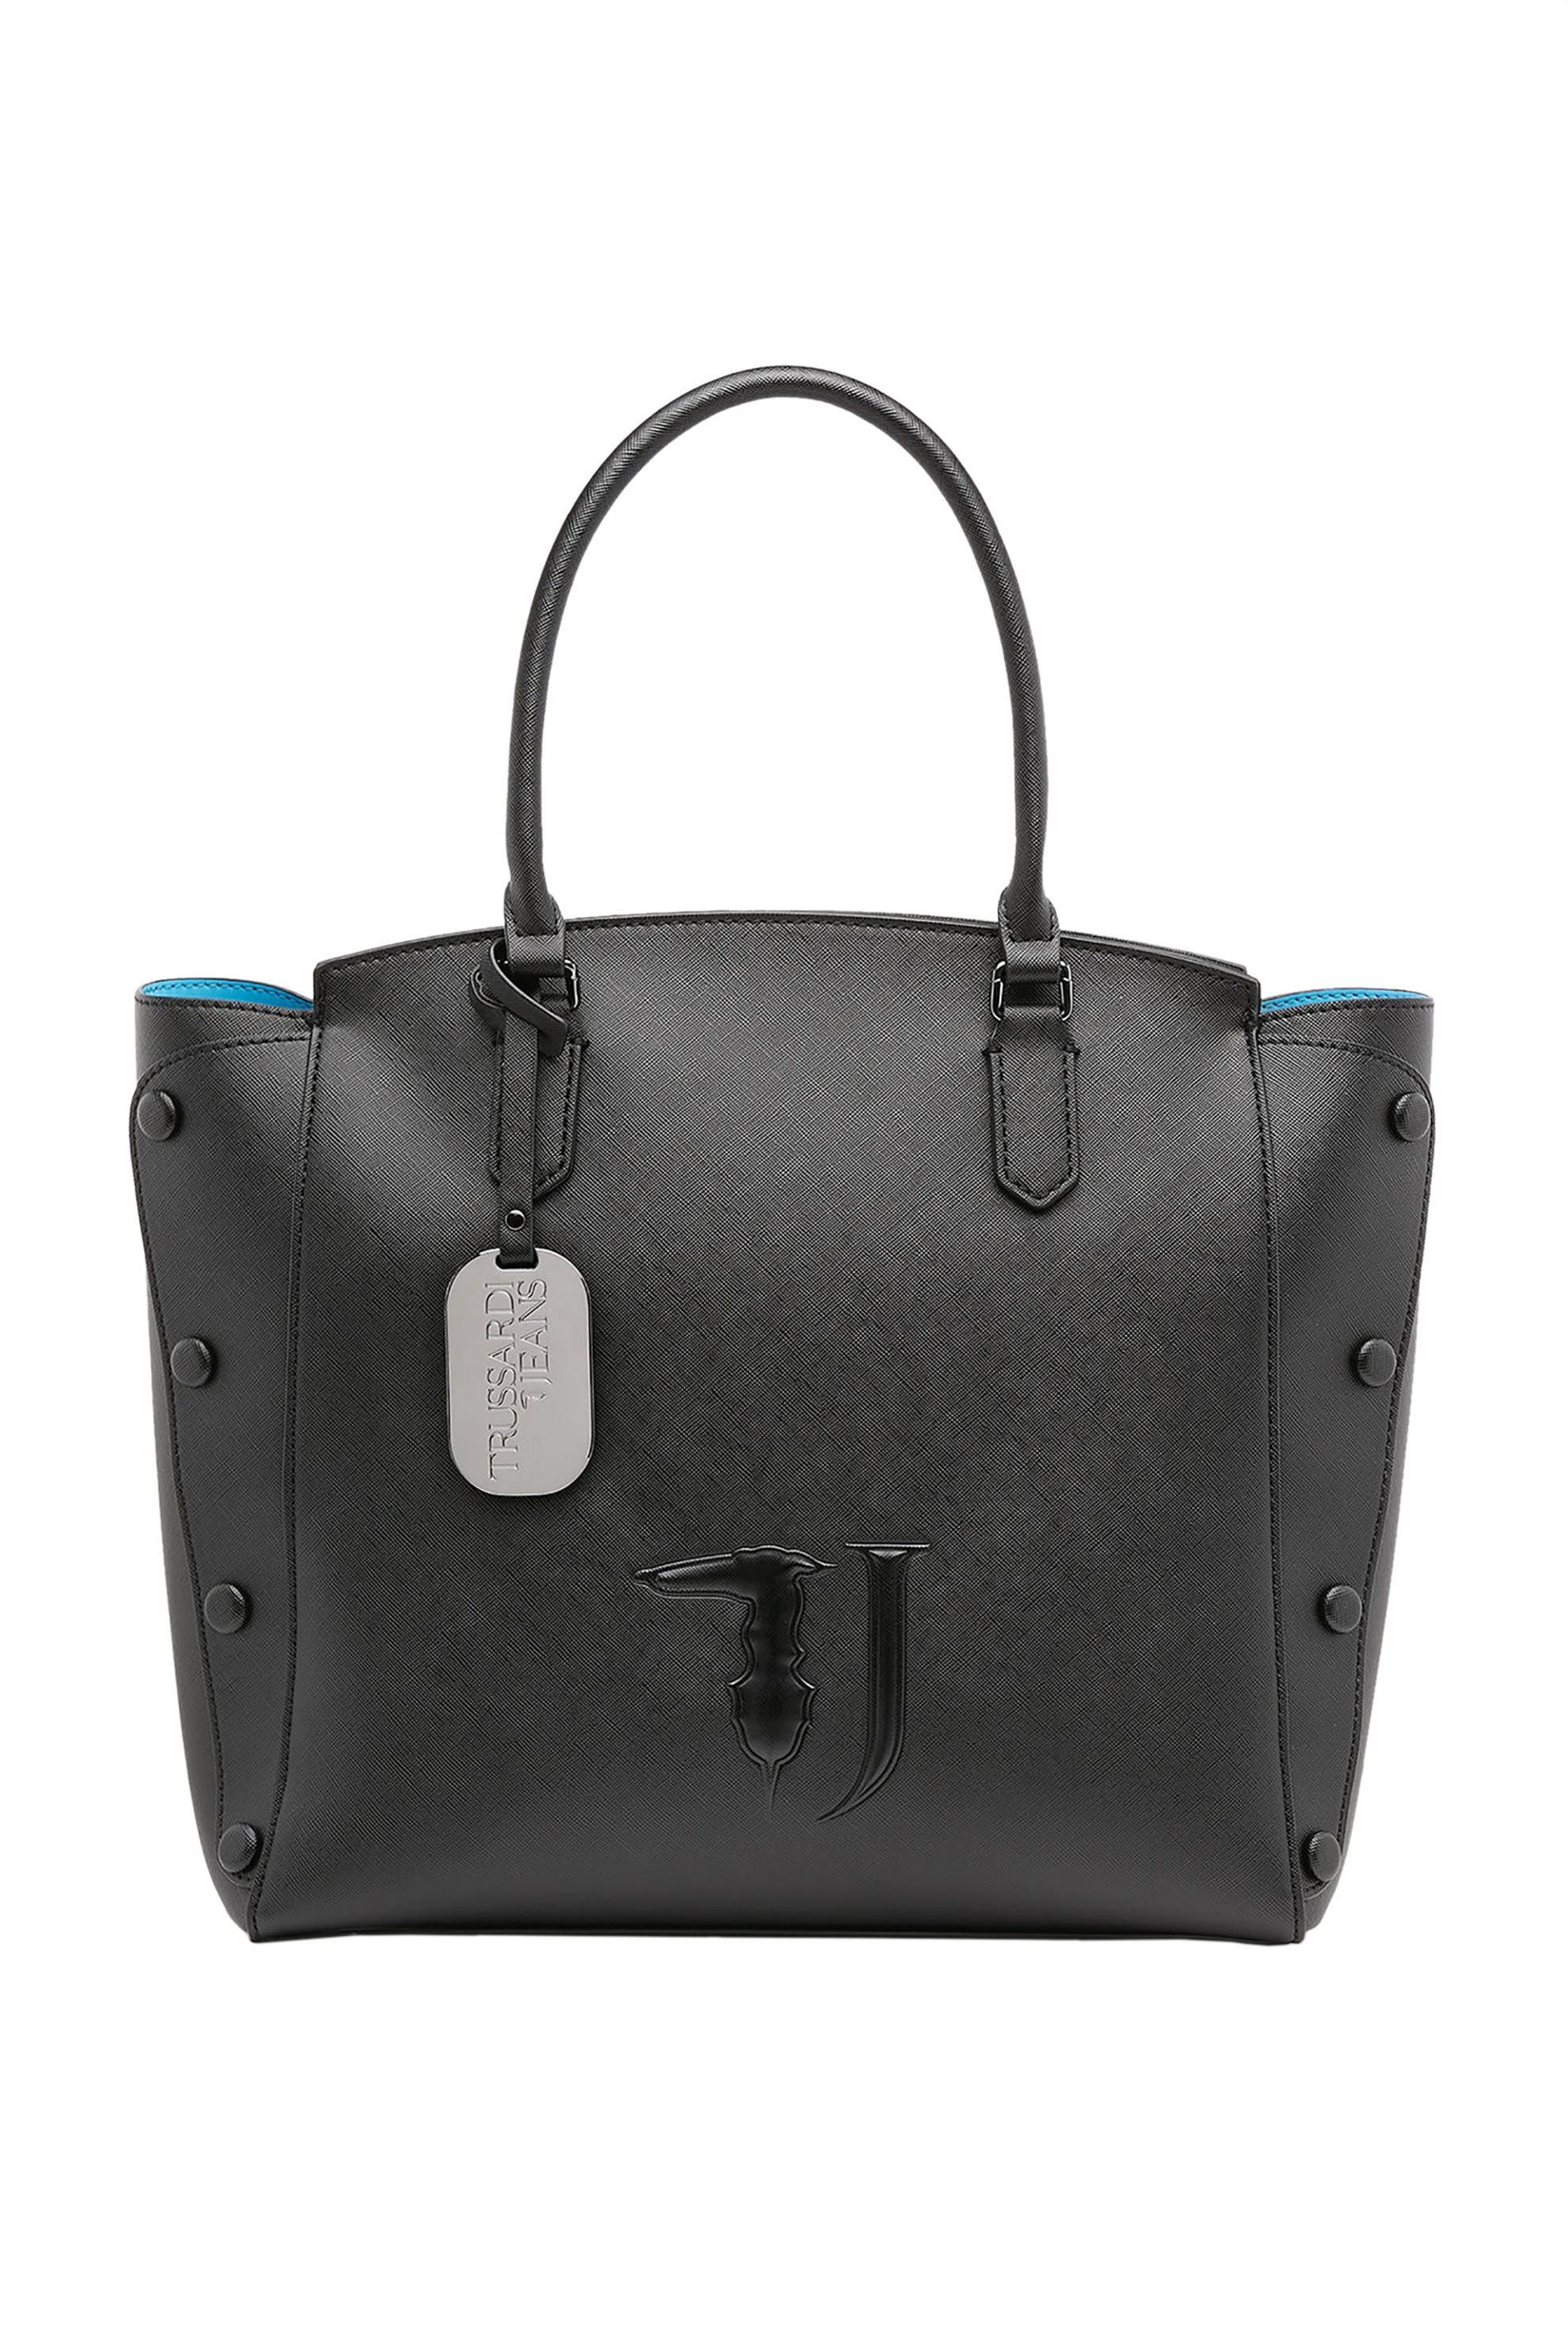 Trussardi Jeans γυναικεία shopping bag Μelissa - 75B00452-9Y099999 - Μαύρο γυναικα   τσαντεσ   ώμου   shopper bags